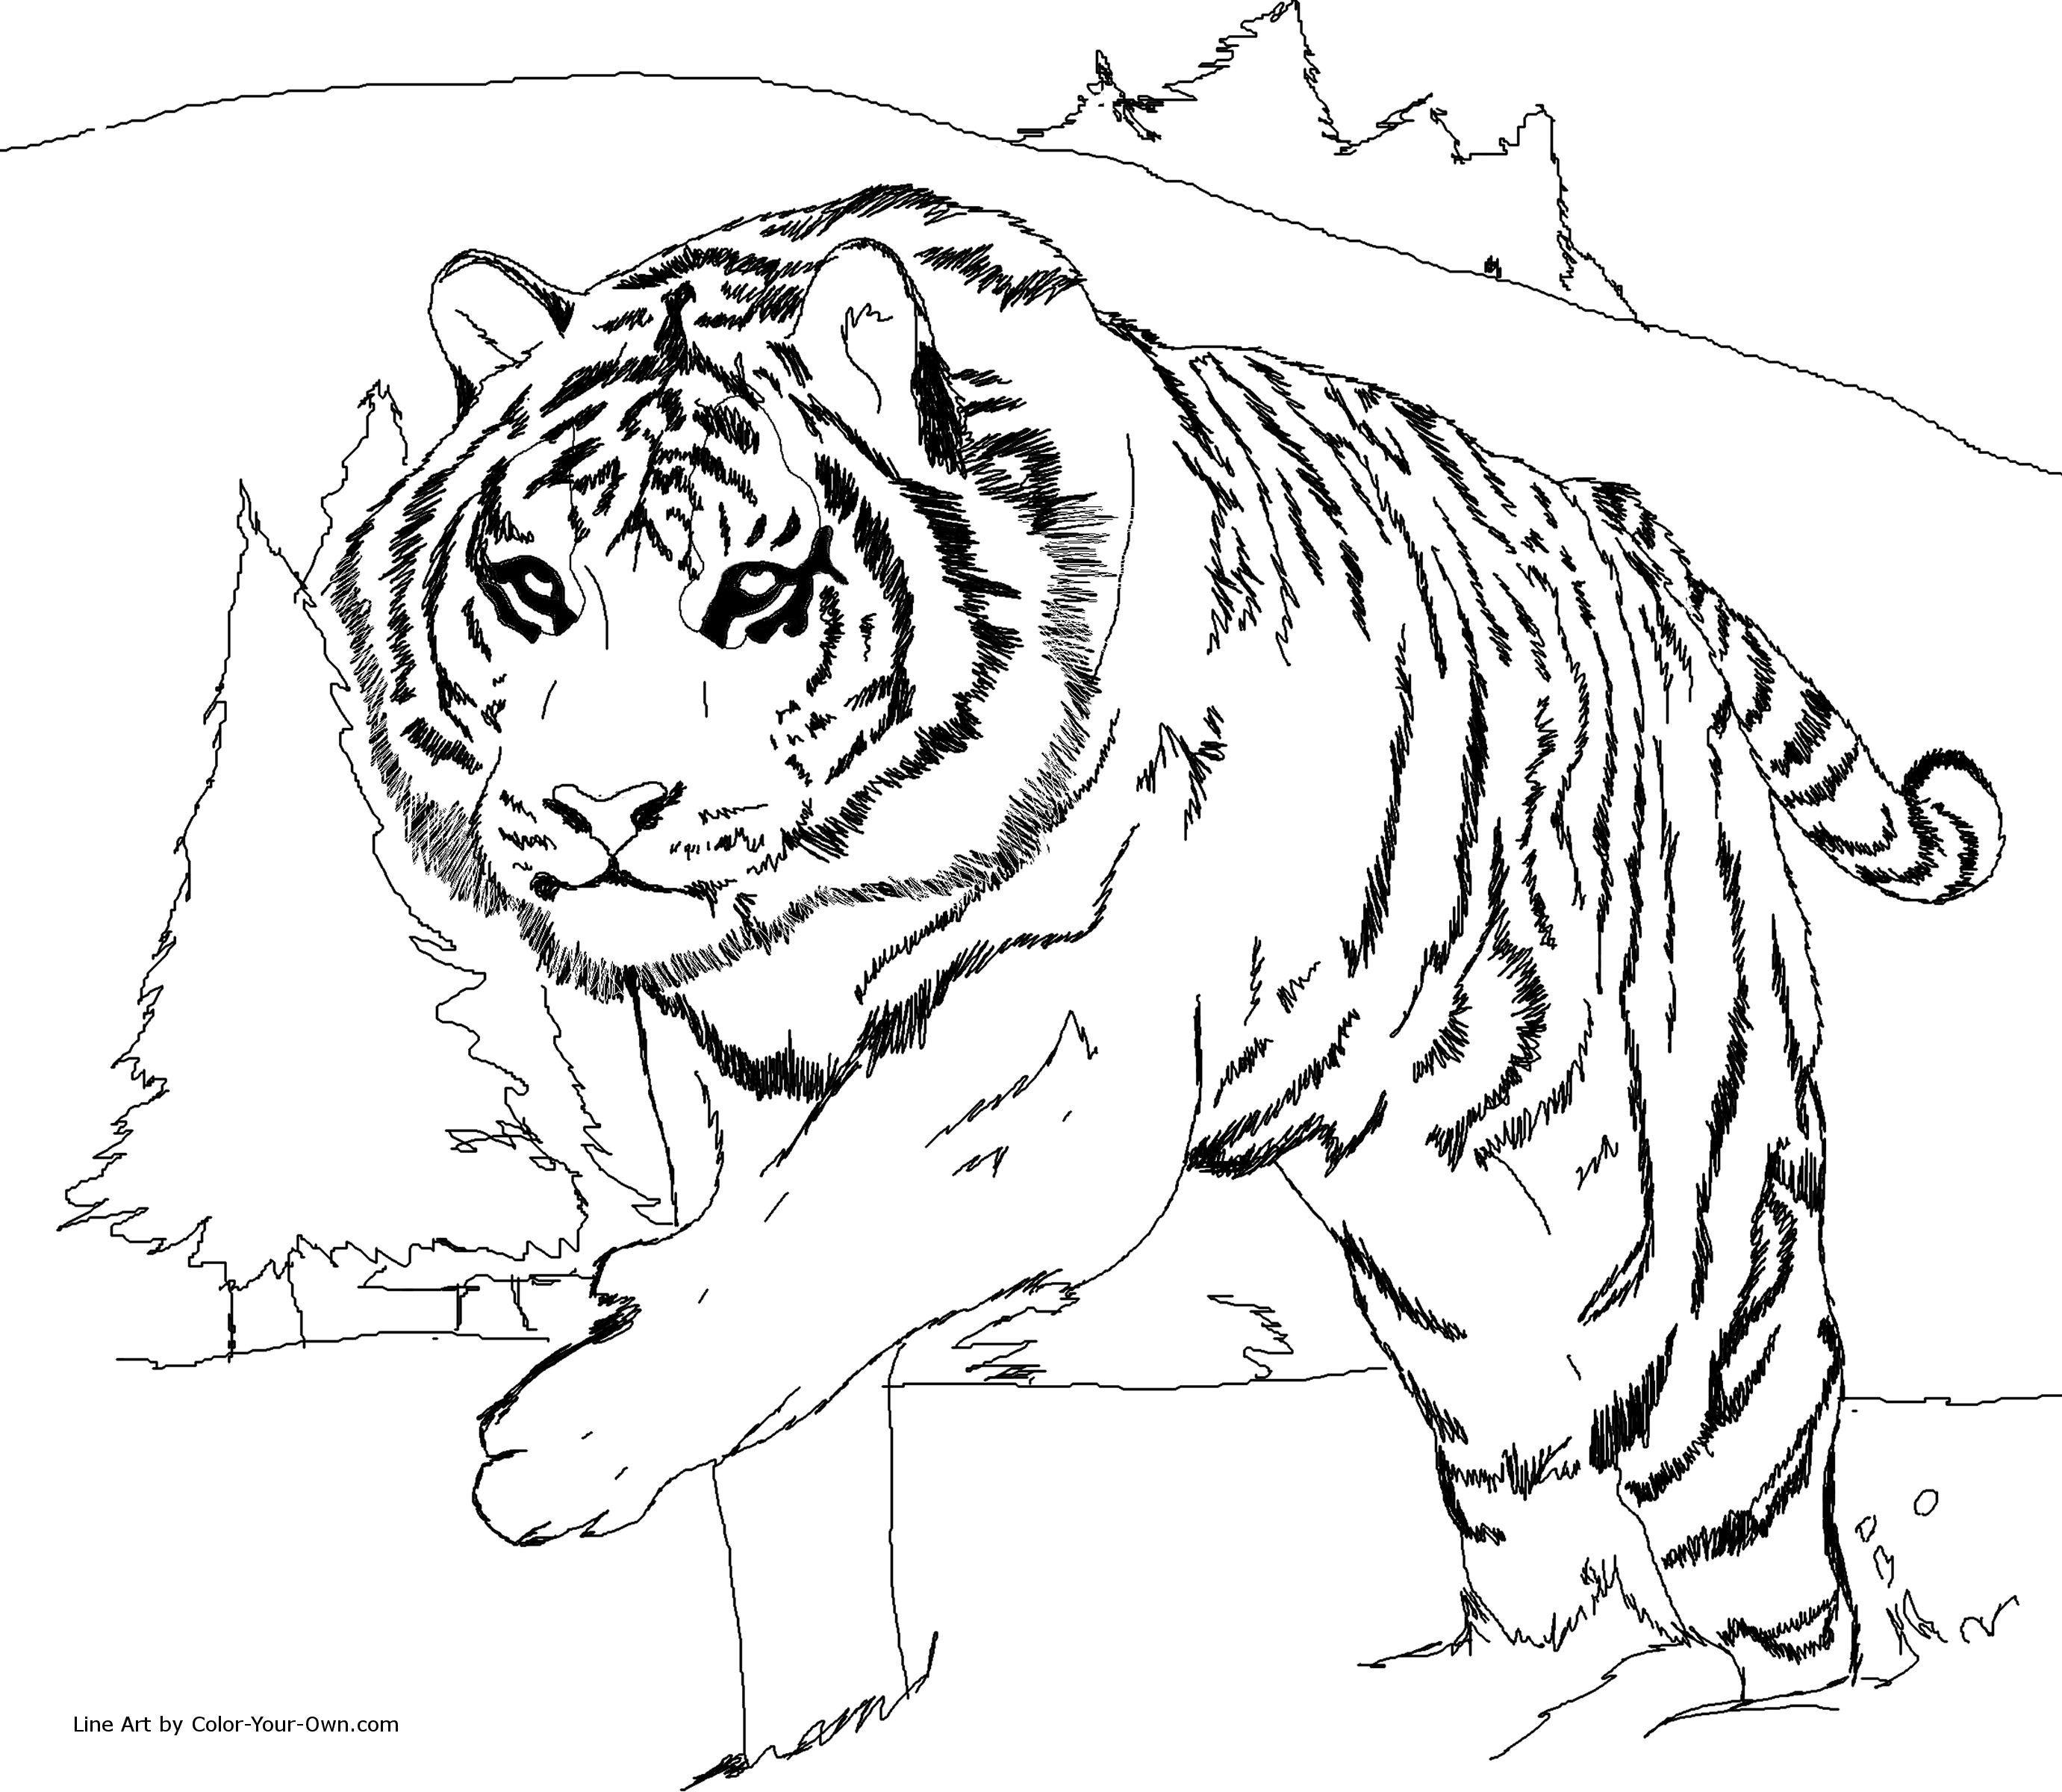 Coloriage Tigre.Dessin Animaux Tigre Sensationnel Construction Dessins De Coloriage